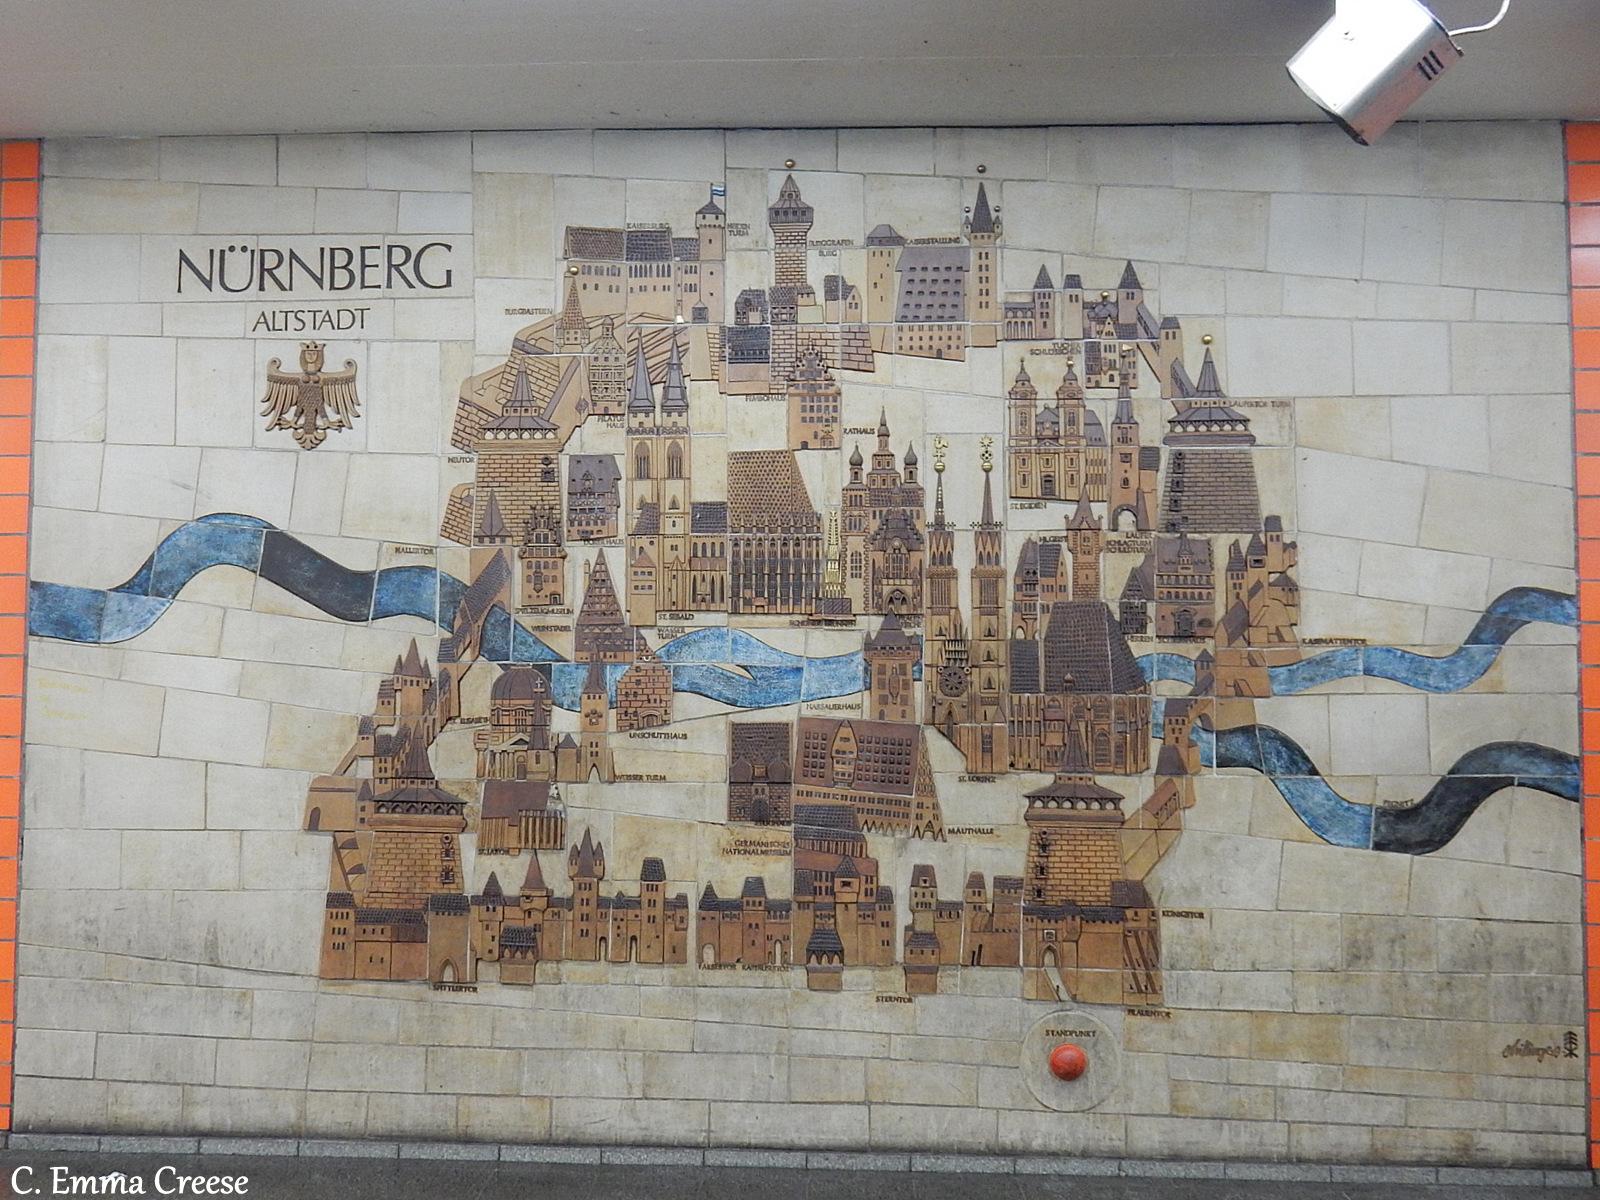 Nuremburg day trip from Munich Adventures of a London Kiwi